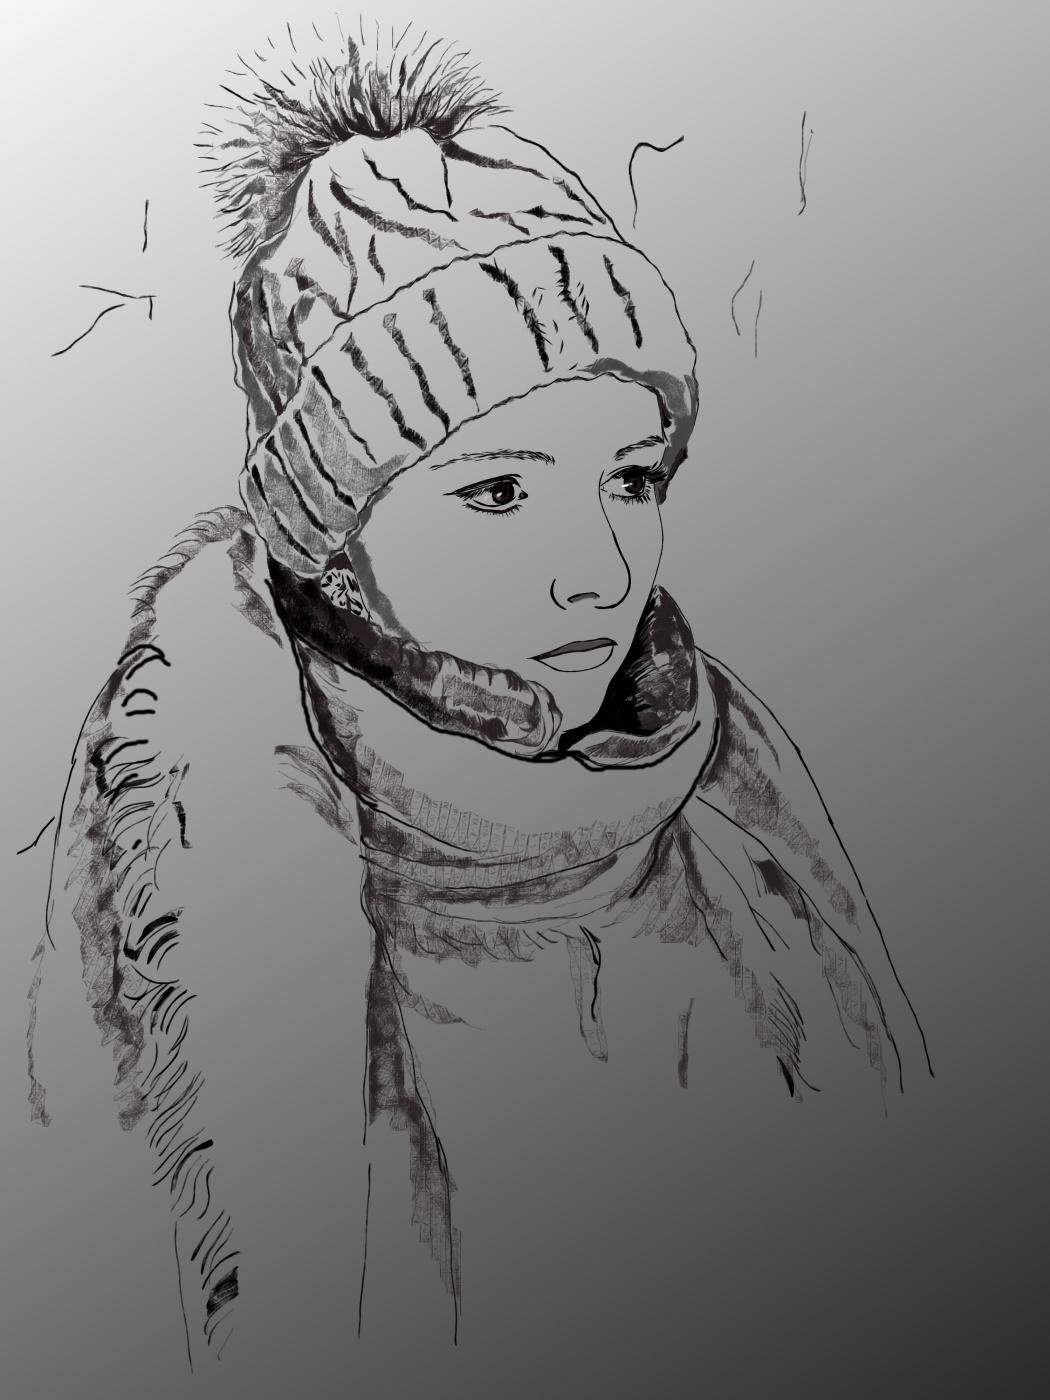 Элеонора Владимировна Чиркова. Автопортрет